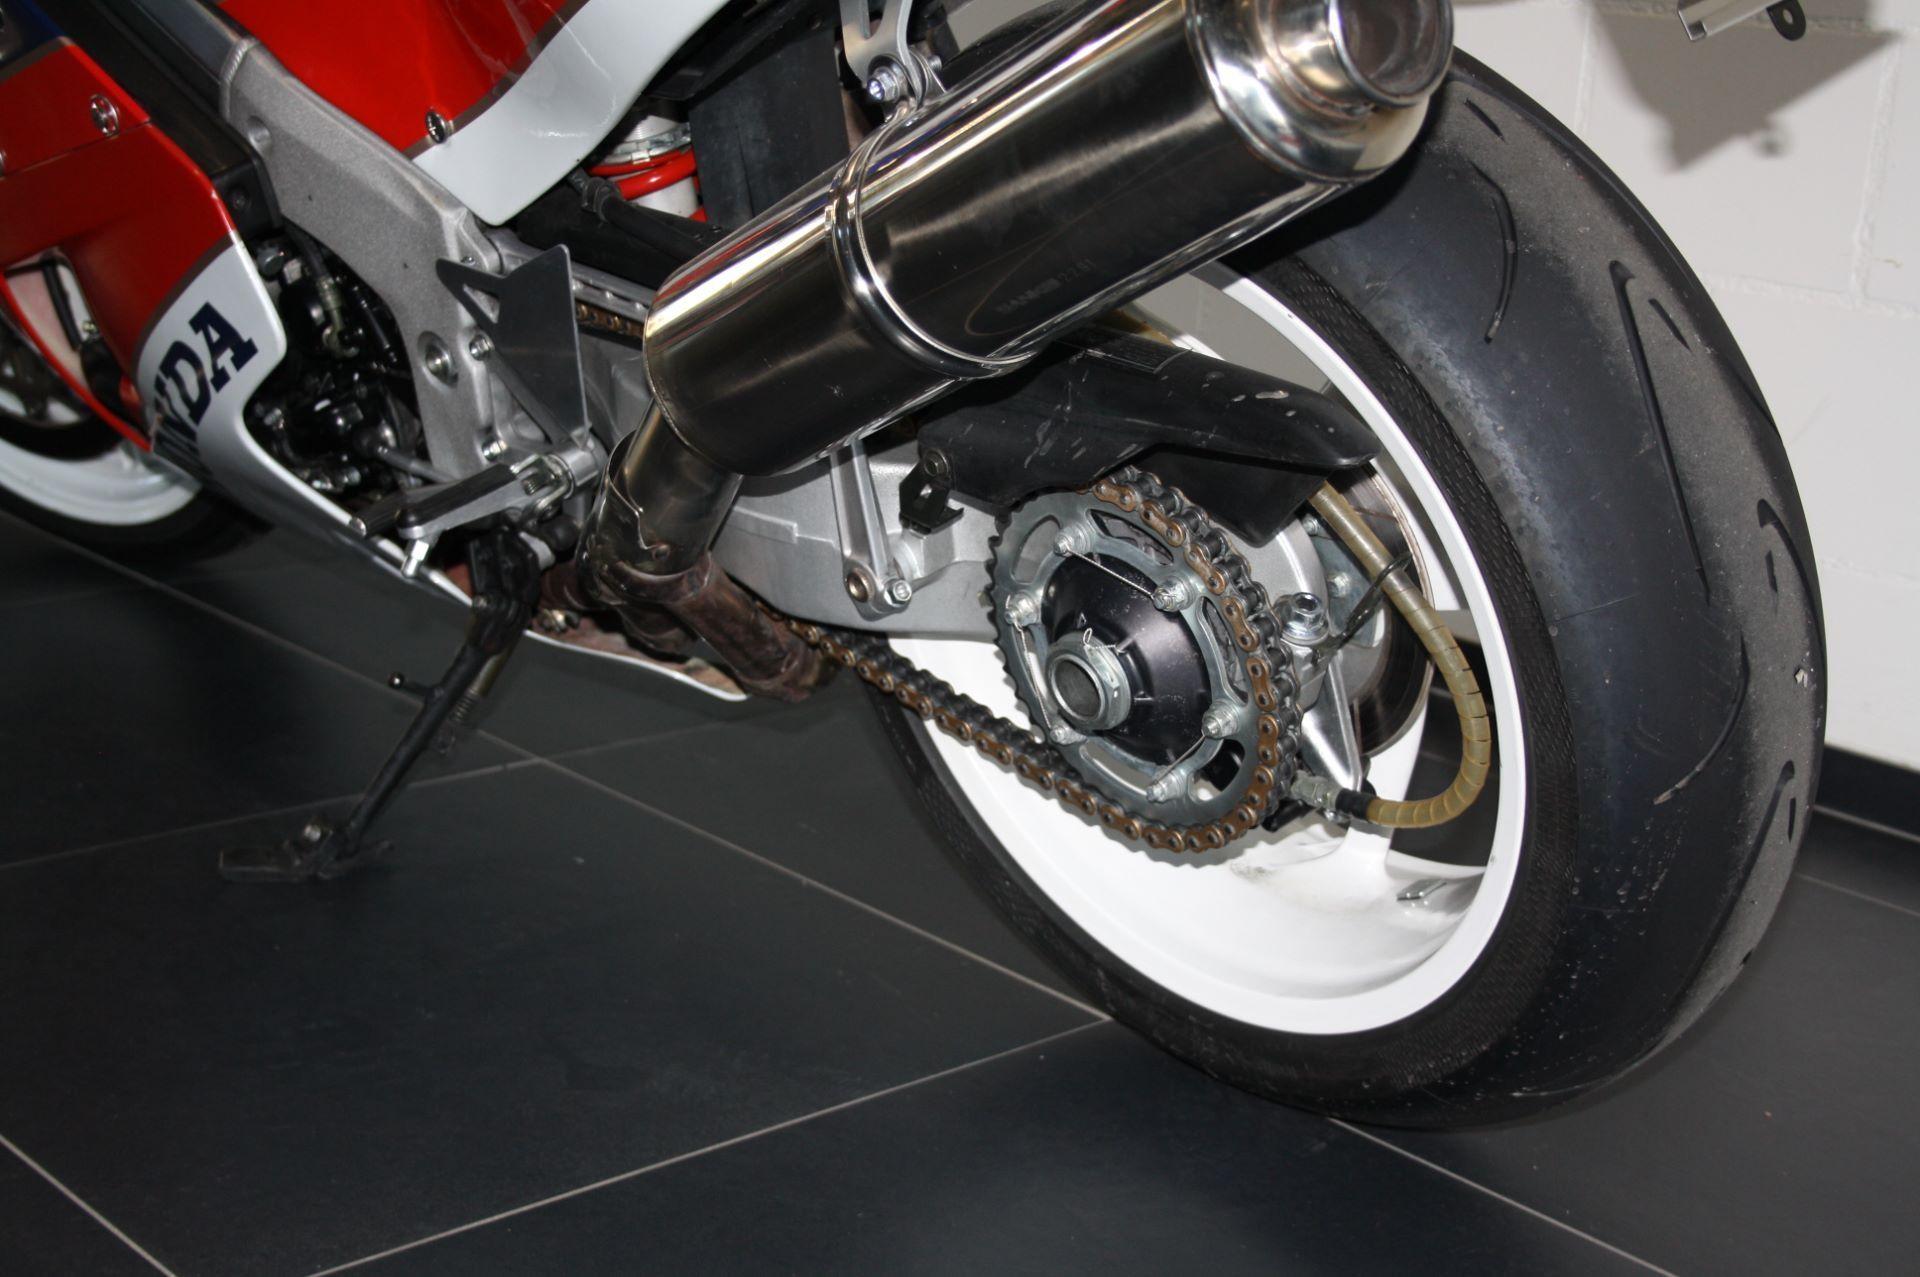 motorrad occasion kaufen honda vfr 750 r rc 30 moto zentralschweiz perlen. Black Bedroom Furniture Sets. Home Design Ideas